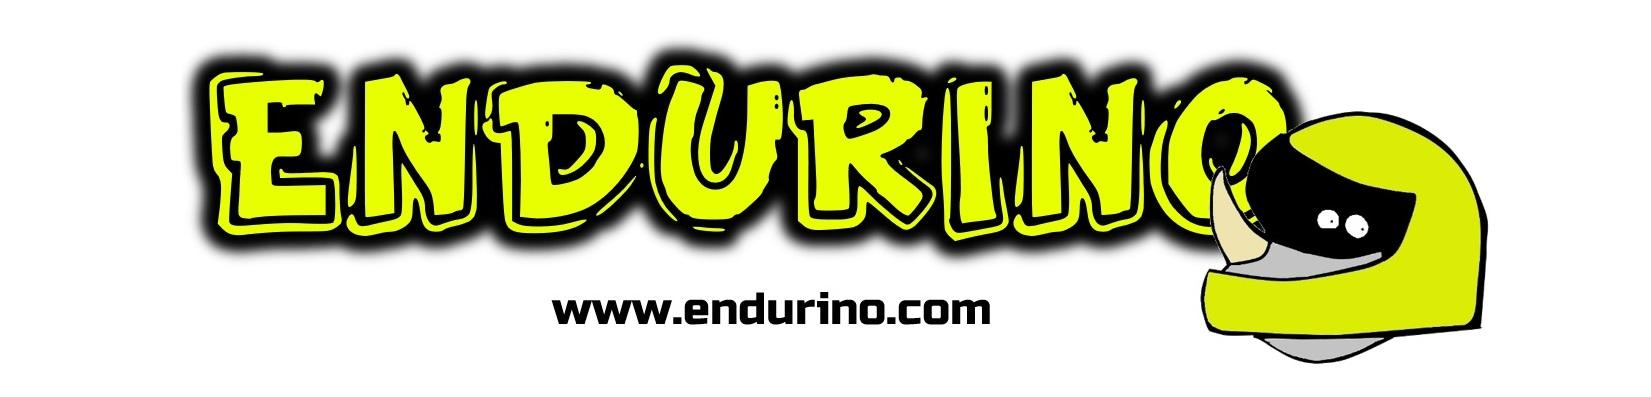 ENDURINO - Triciclo senza pedali